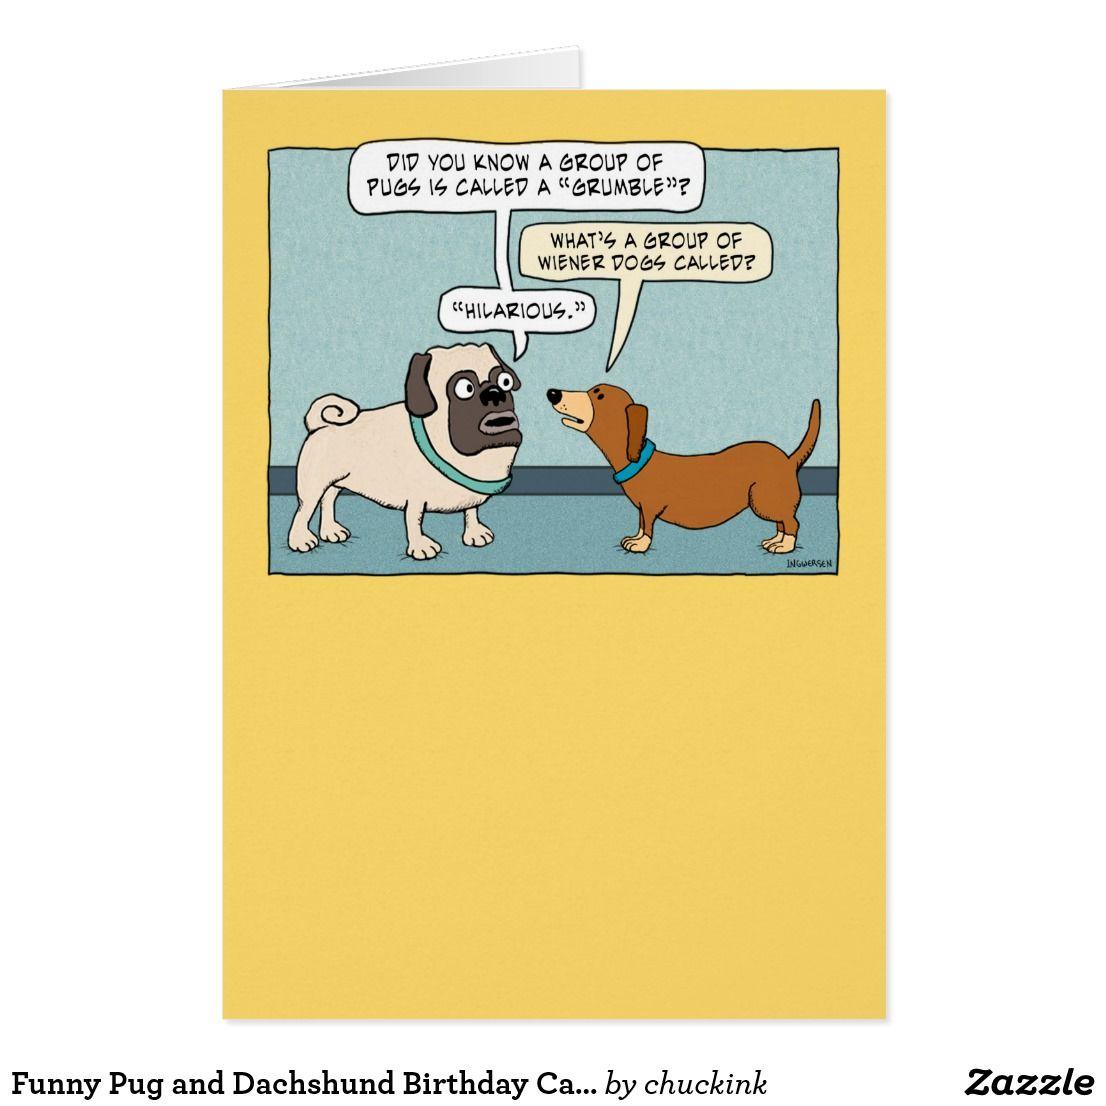 Funny Pug And Dachshund Birthday Card Dachshunds And Birthdays